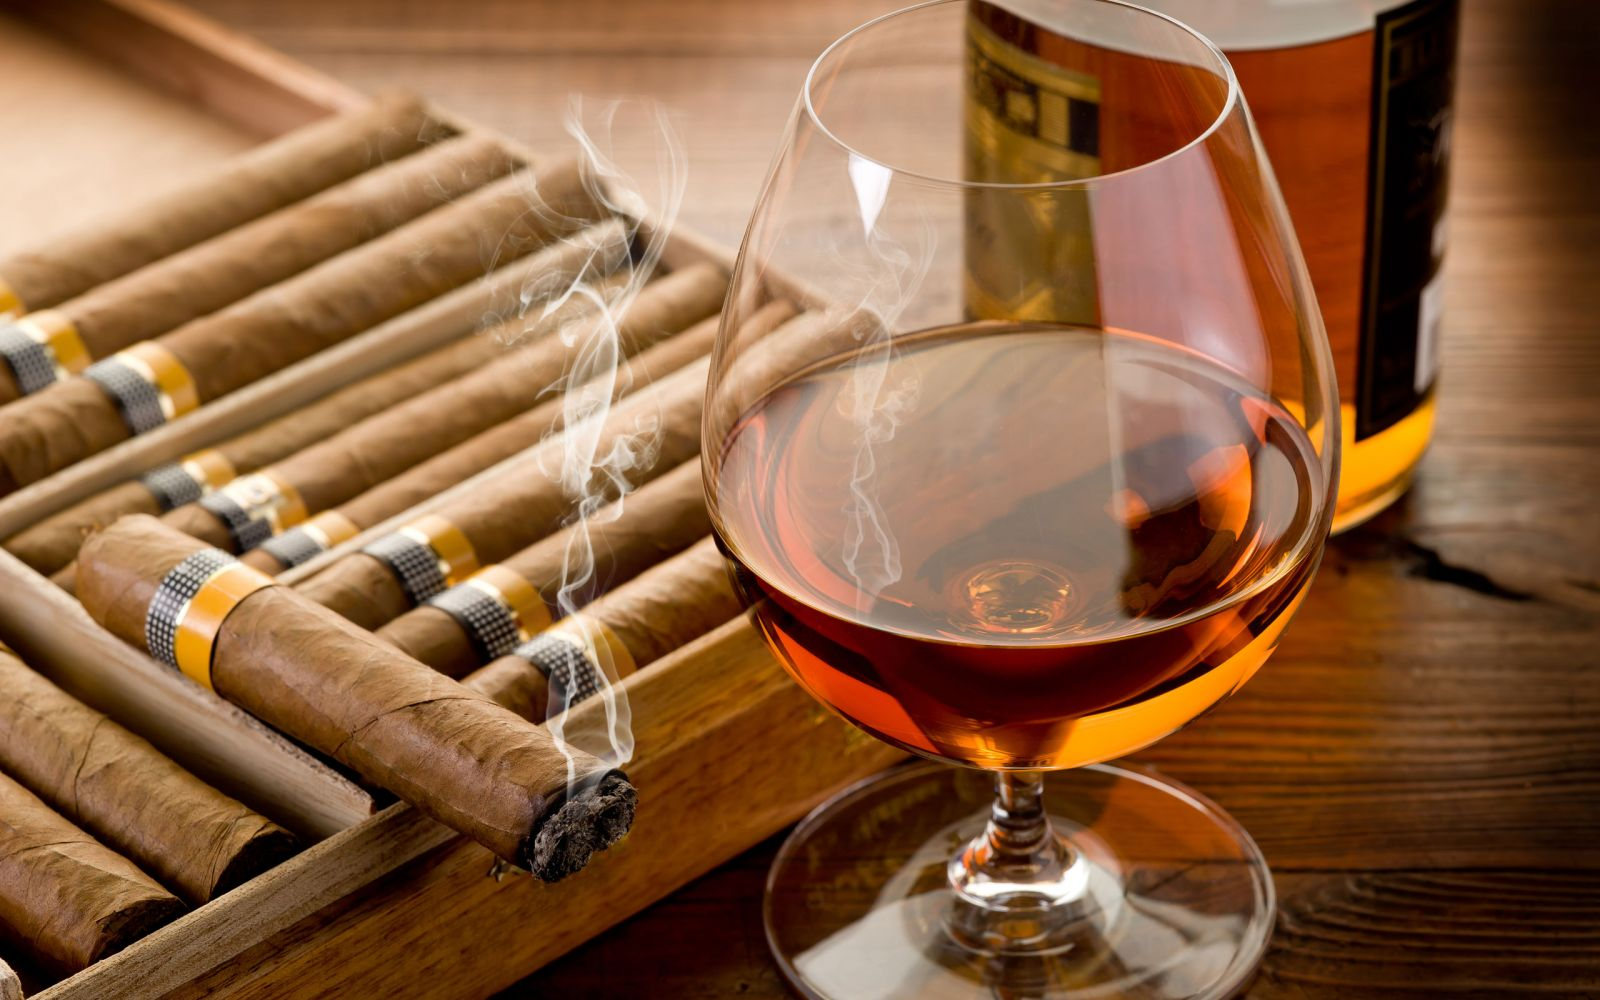 https://i1.wp.com/www.cursodecocteles.com/img/site/images/Cigar-Smoke-And-Cognac.jpeg